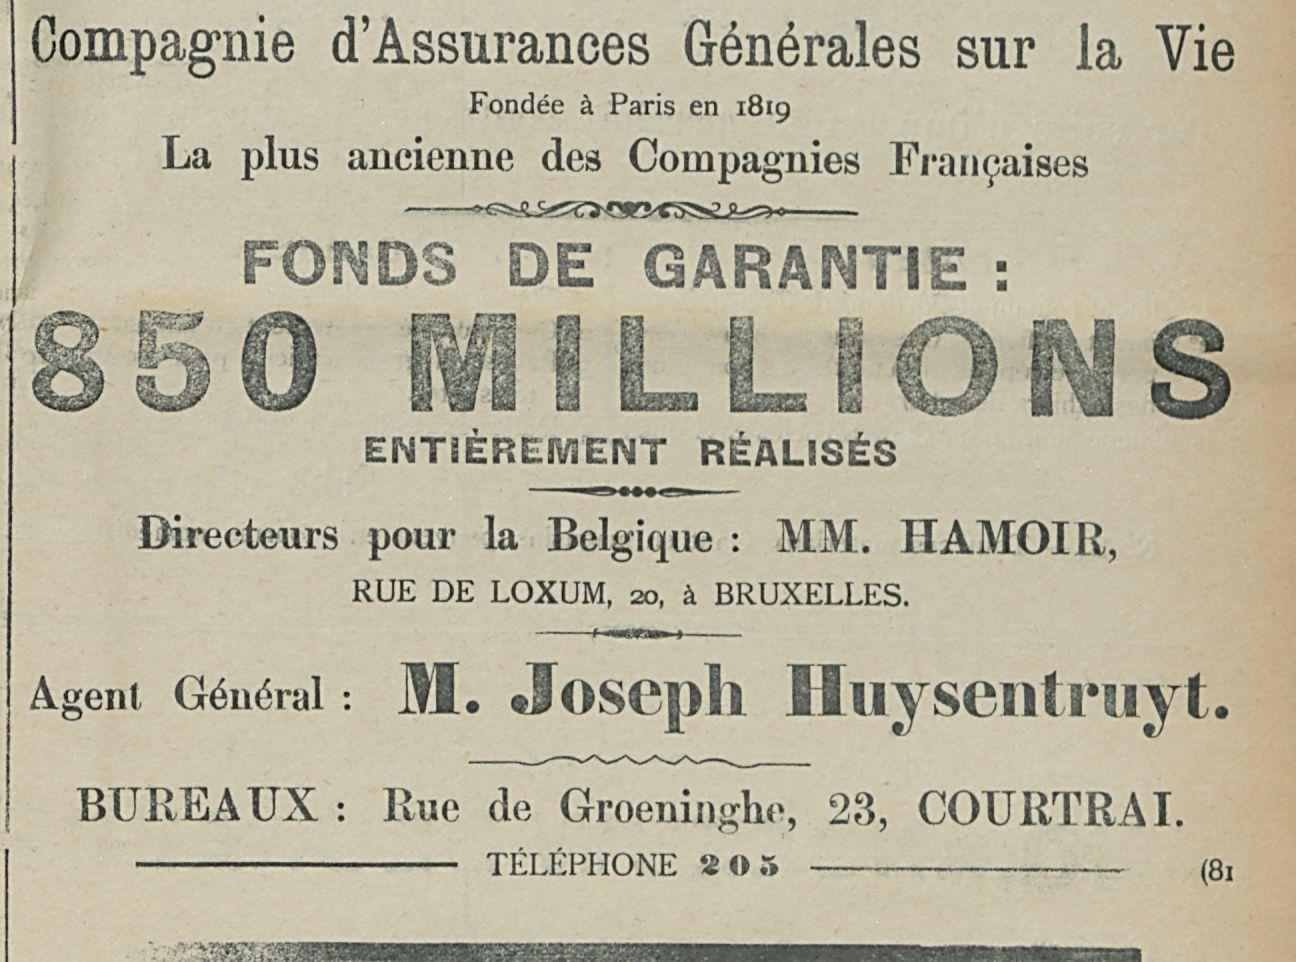 850 MILLIONS